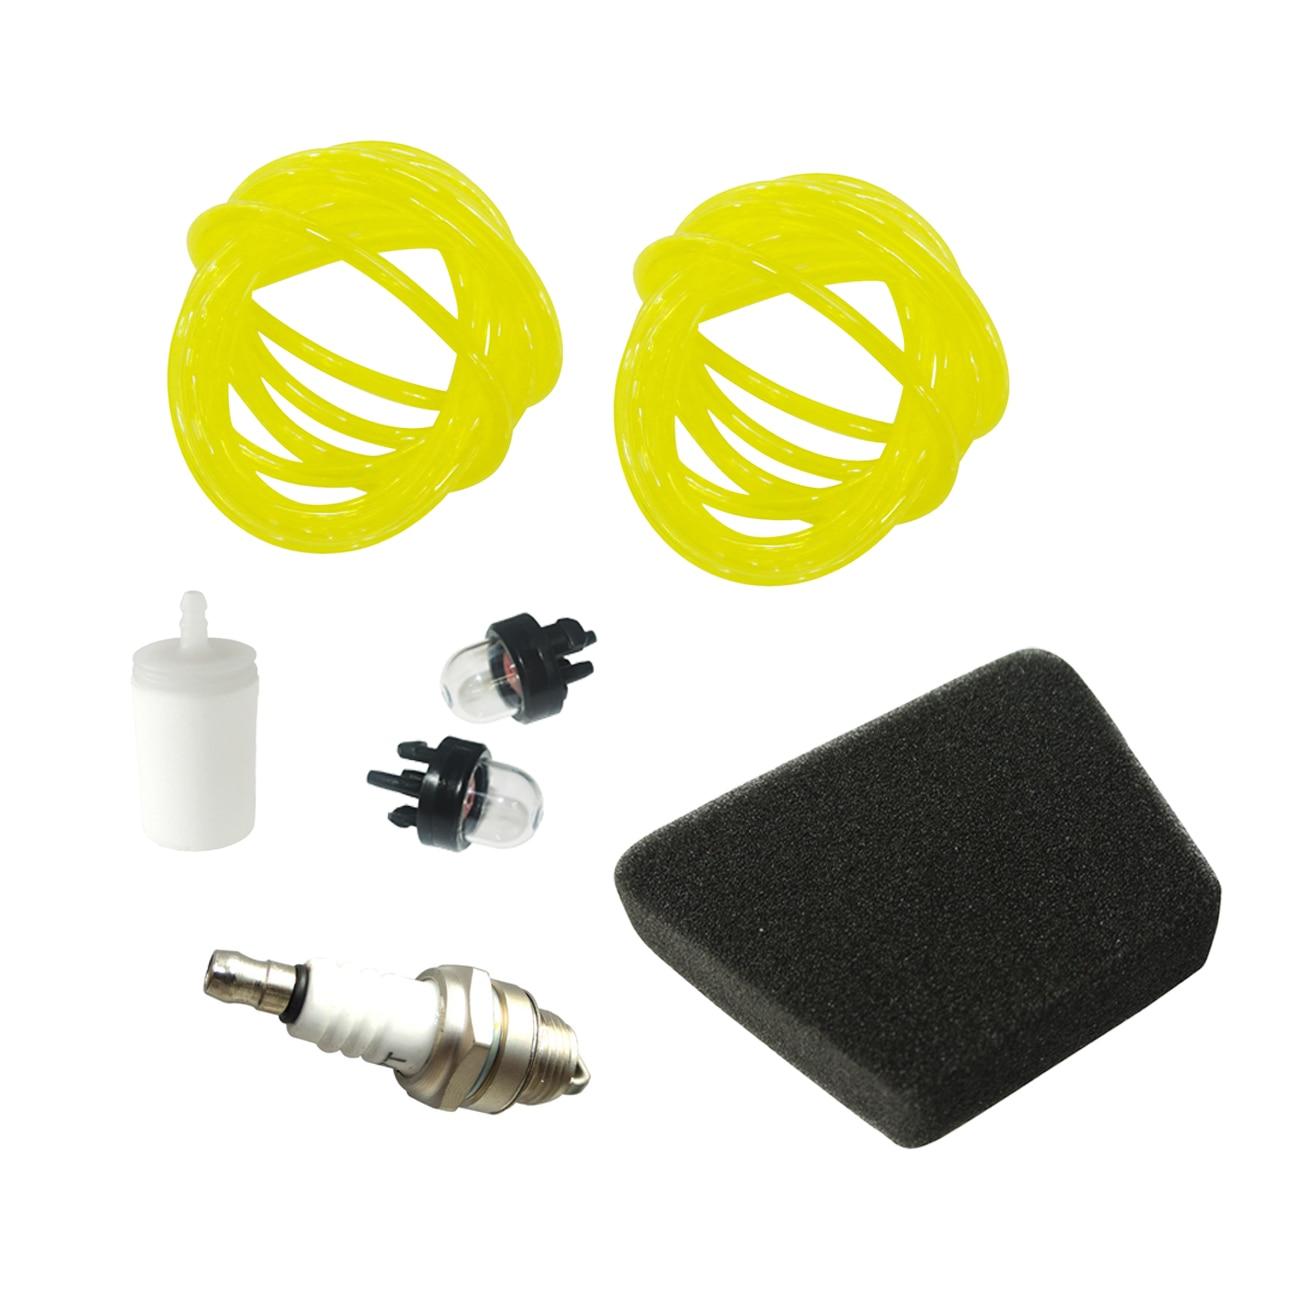 5 Pz Air Filter Cleaner Husqvar Na Poulan 545061801 235 235e 240 Chainsaw Fuel Primer Bulb 188 513 Line 530037793 Kit Replaces